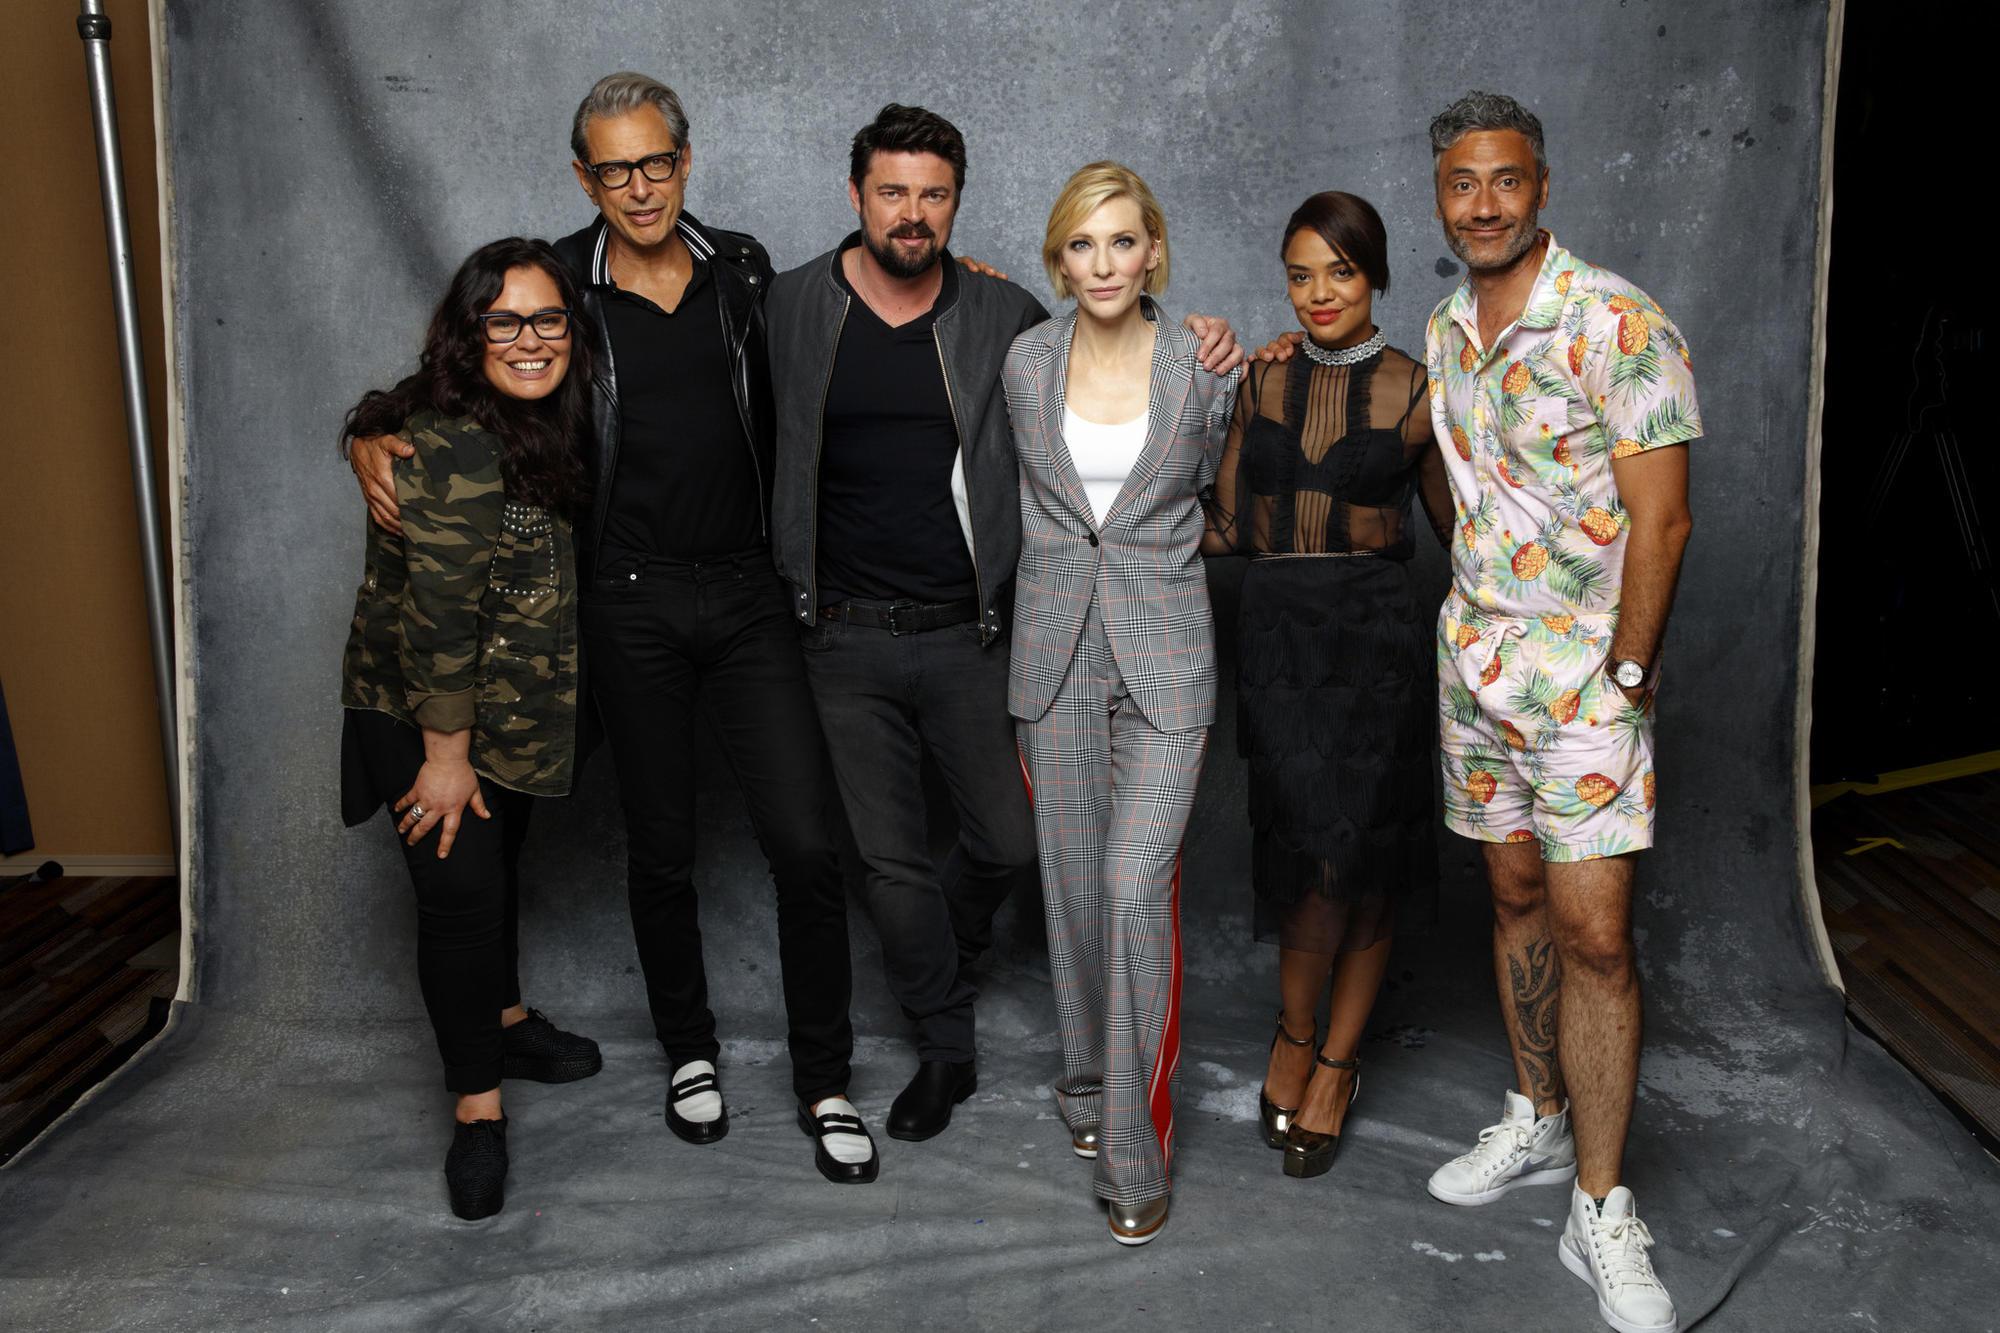 """Thor: Ragnarok's"" Rachel House, left, Jeff Goldblum, Karl Urban, Cate Blanchett, Tessa Thompson and director Taika Waititi. (Jay L. Clendenin / Los Angeles Times)"